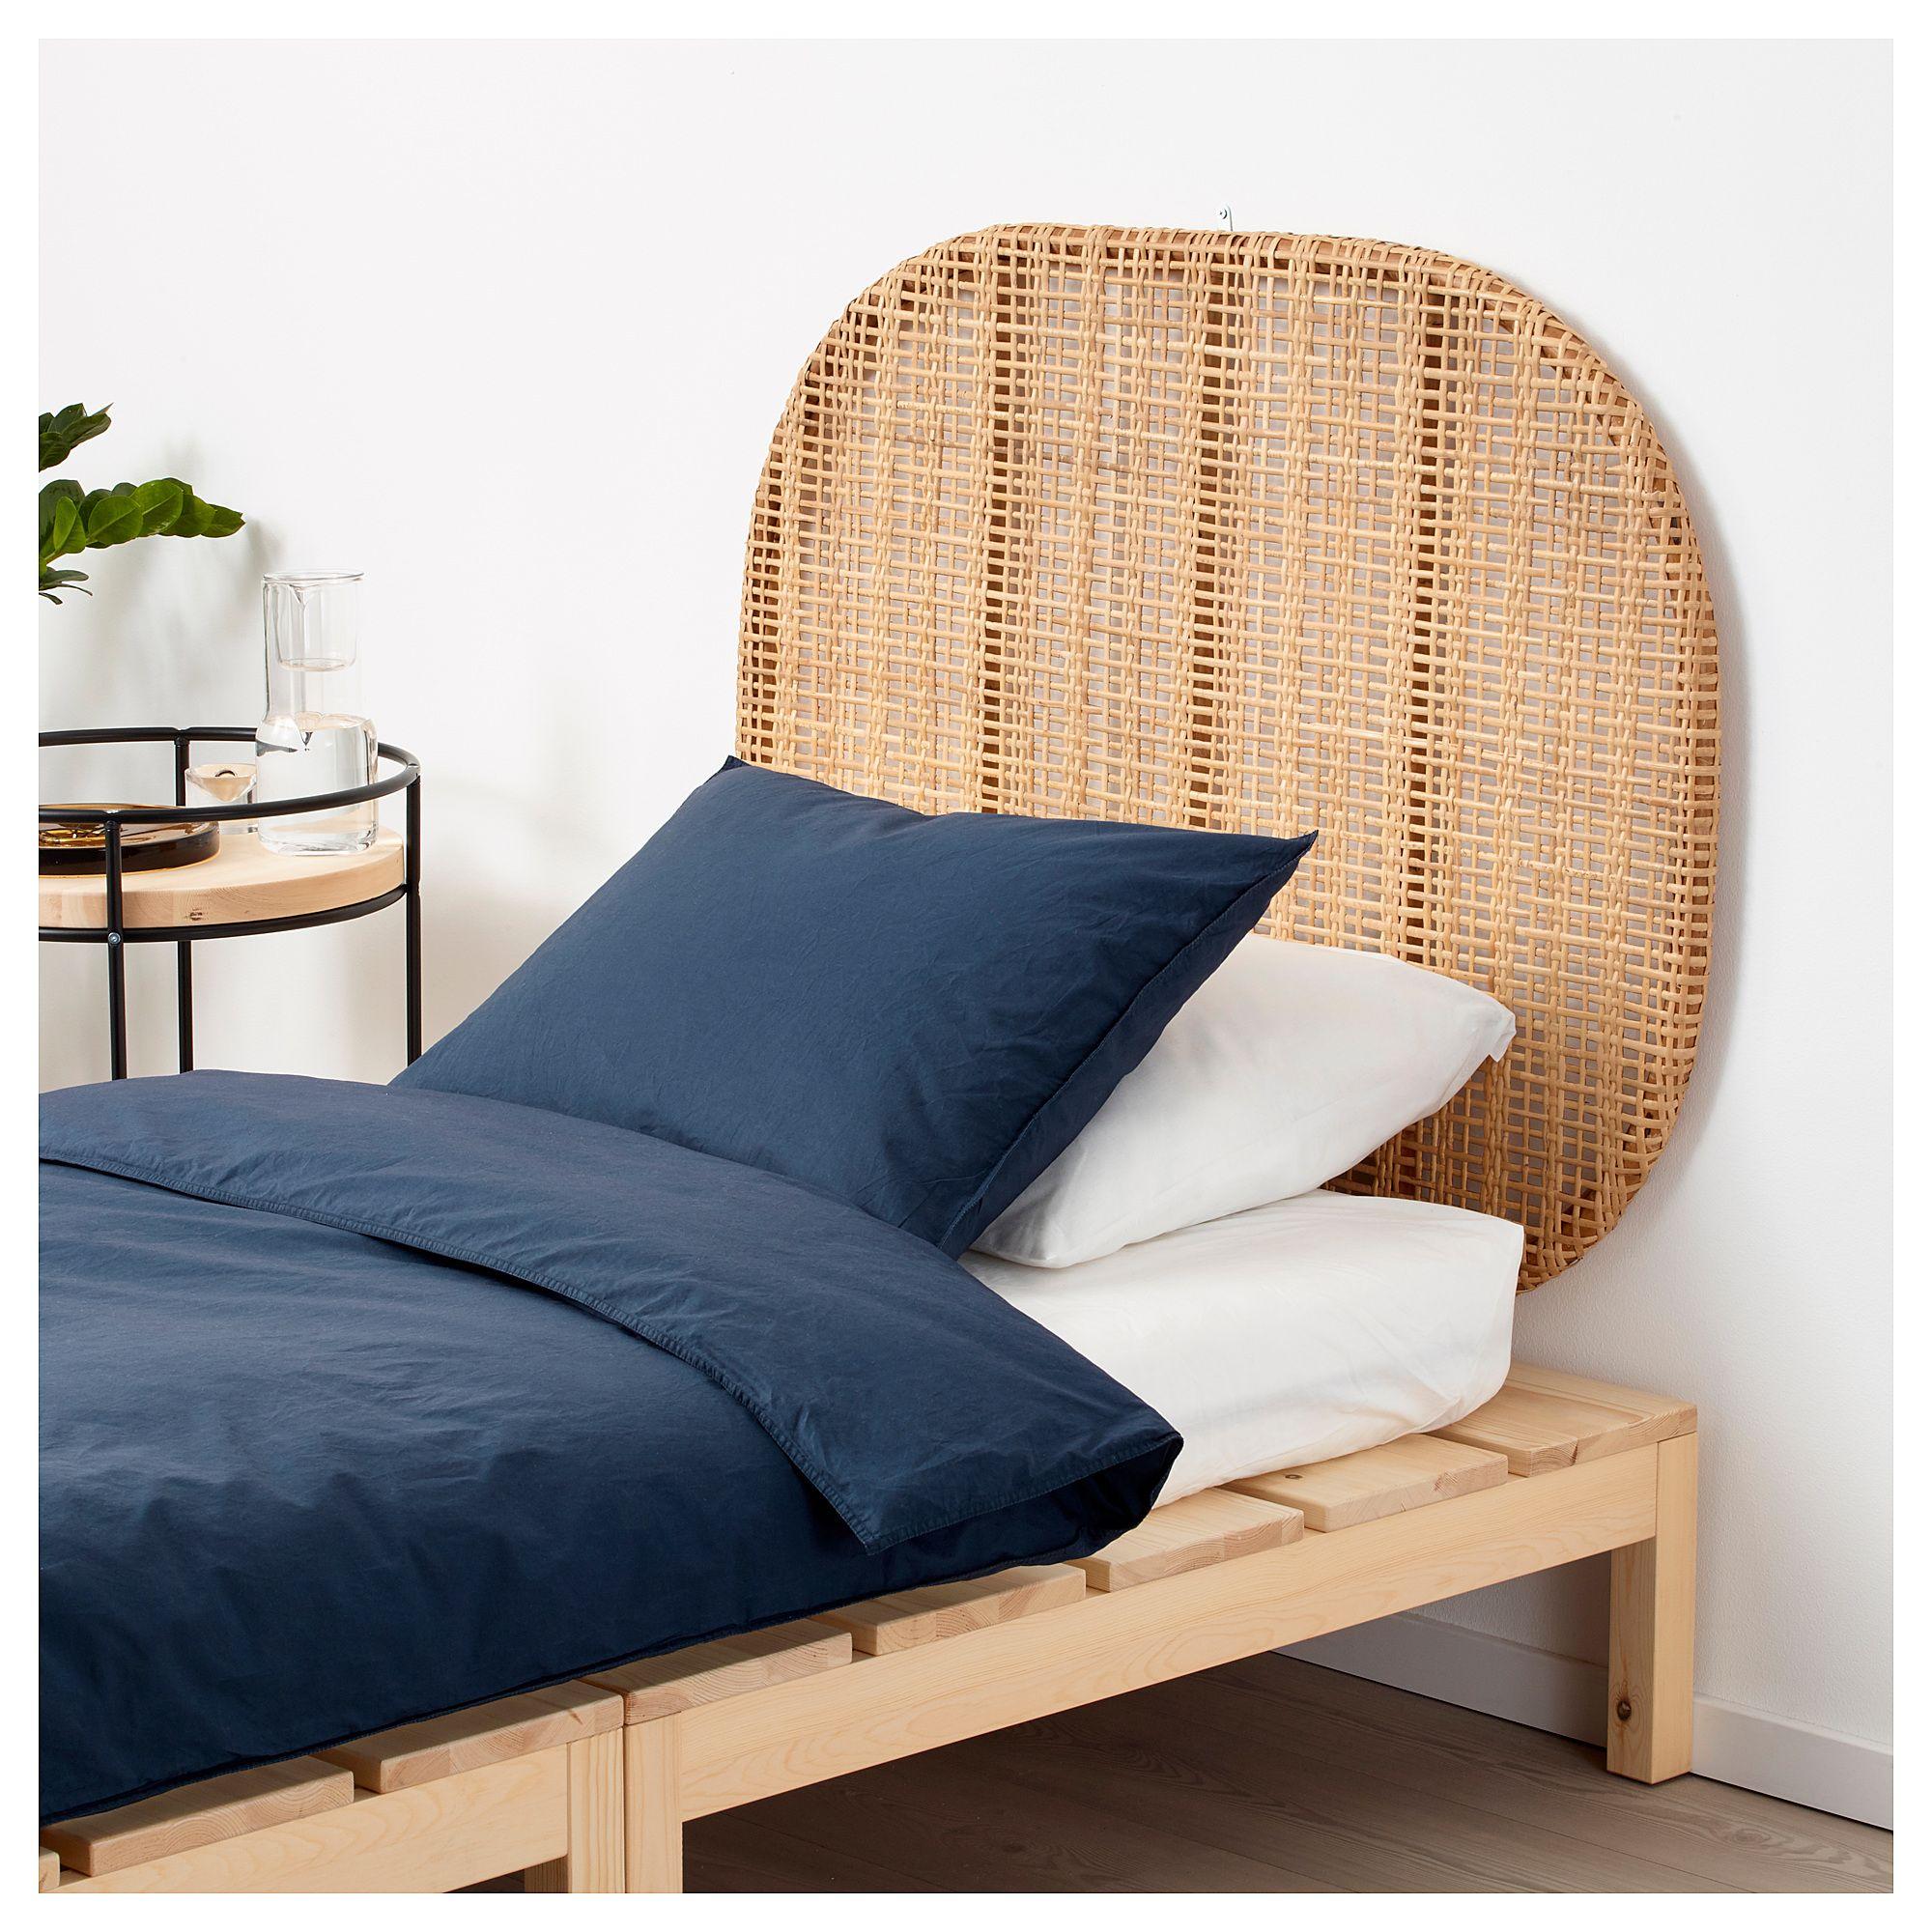 Ikea Suisse Amenagement Original Pour Ta Maison Bedroom Furniture Makeover Furniture Ikea Headboard